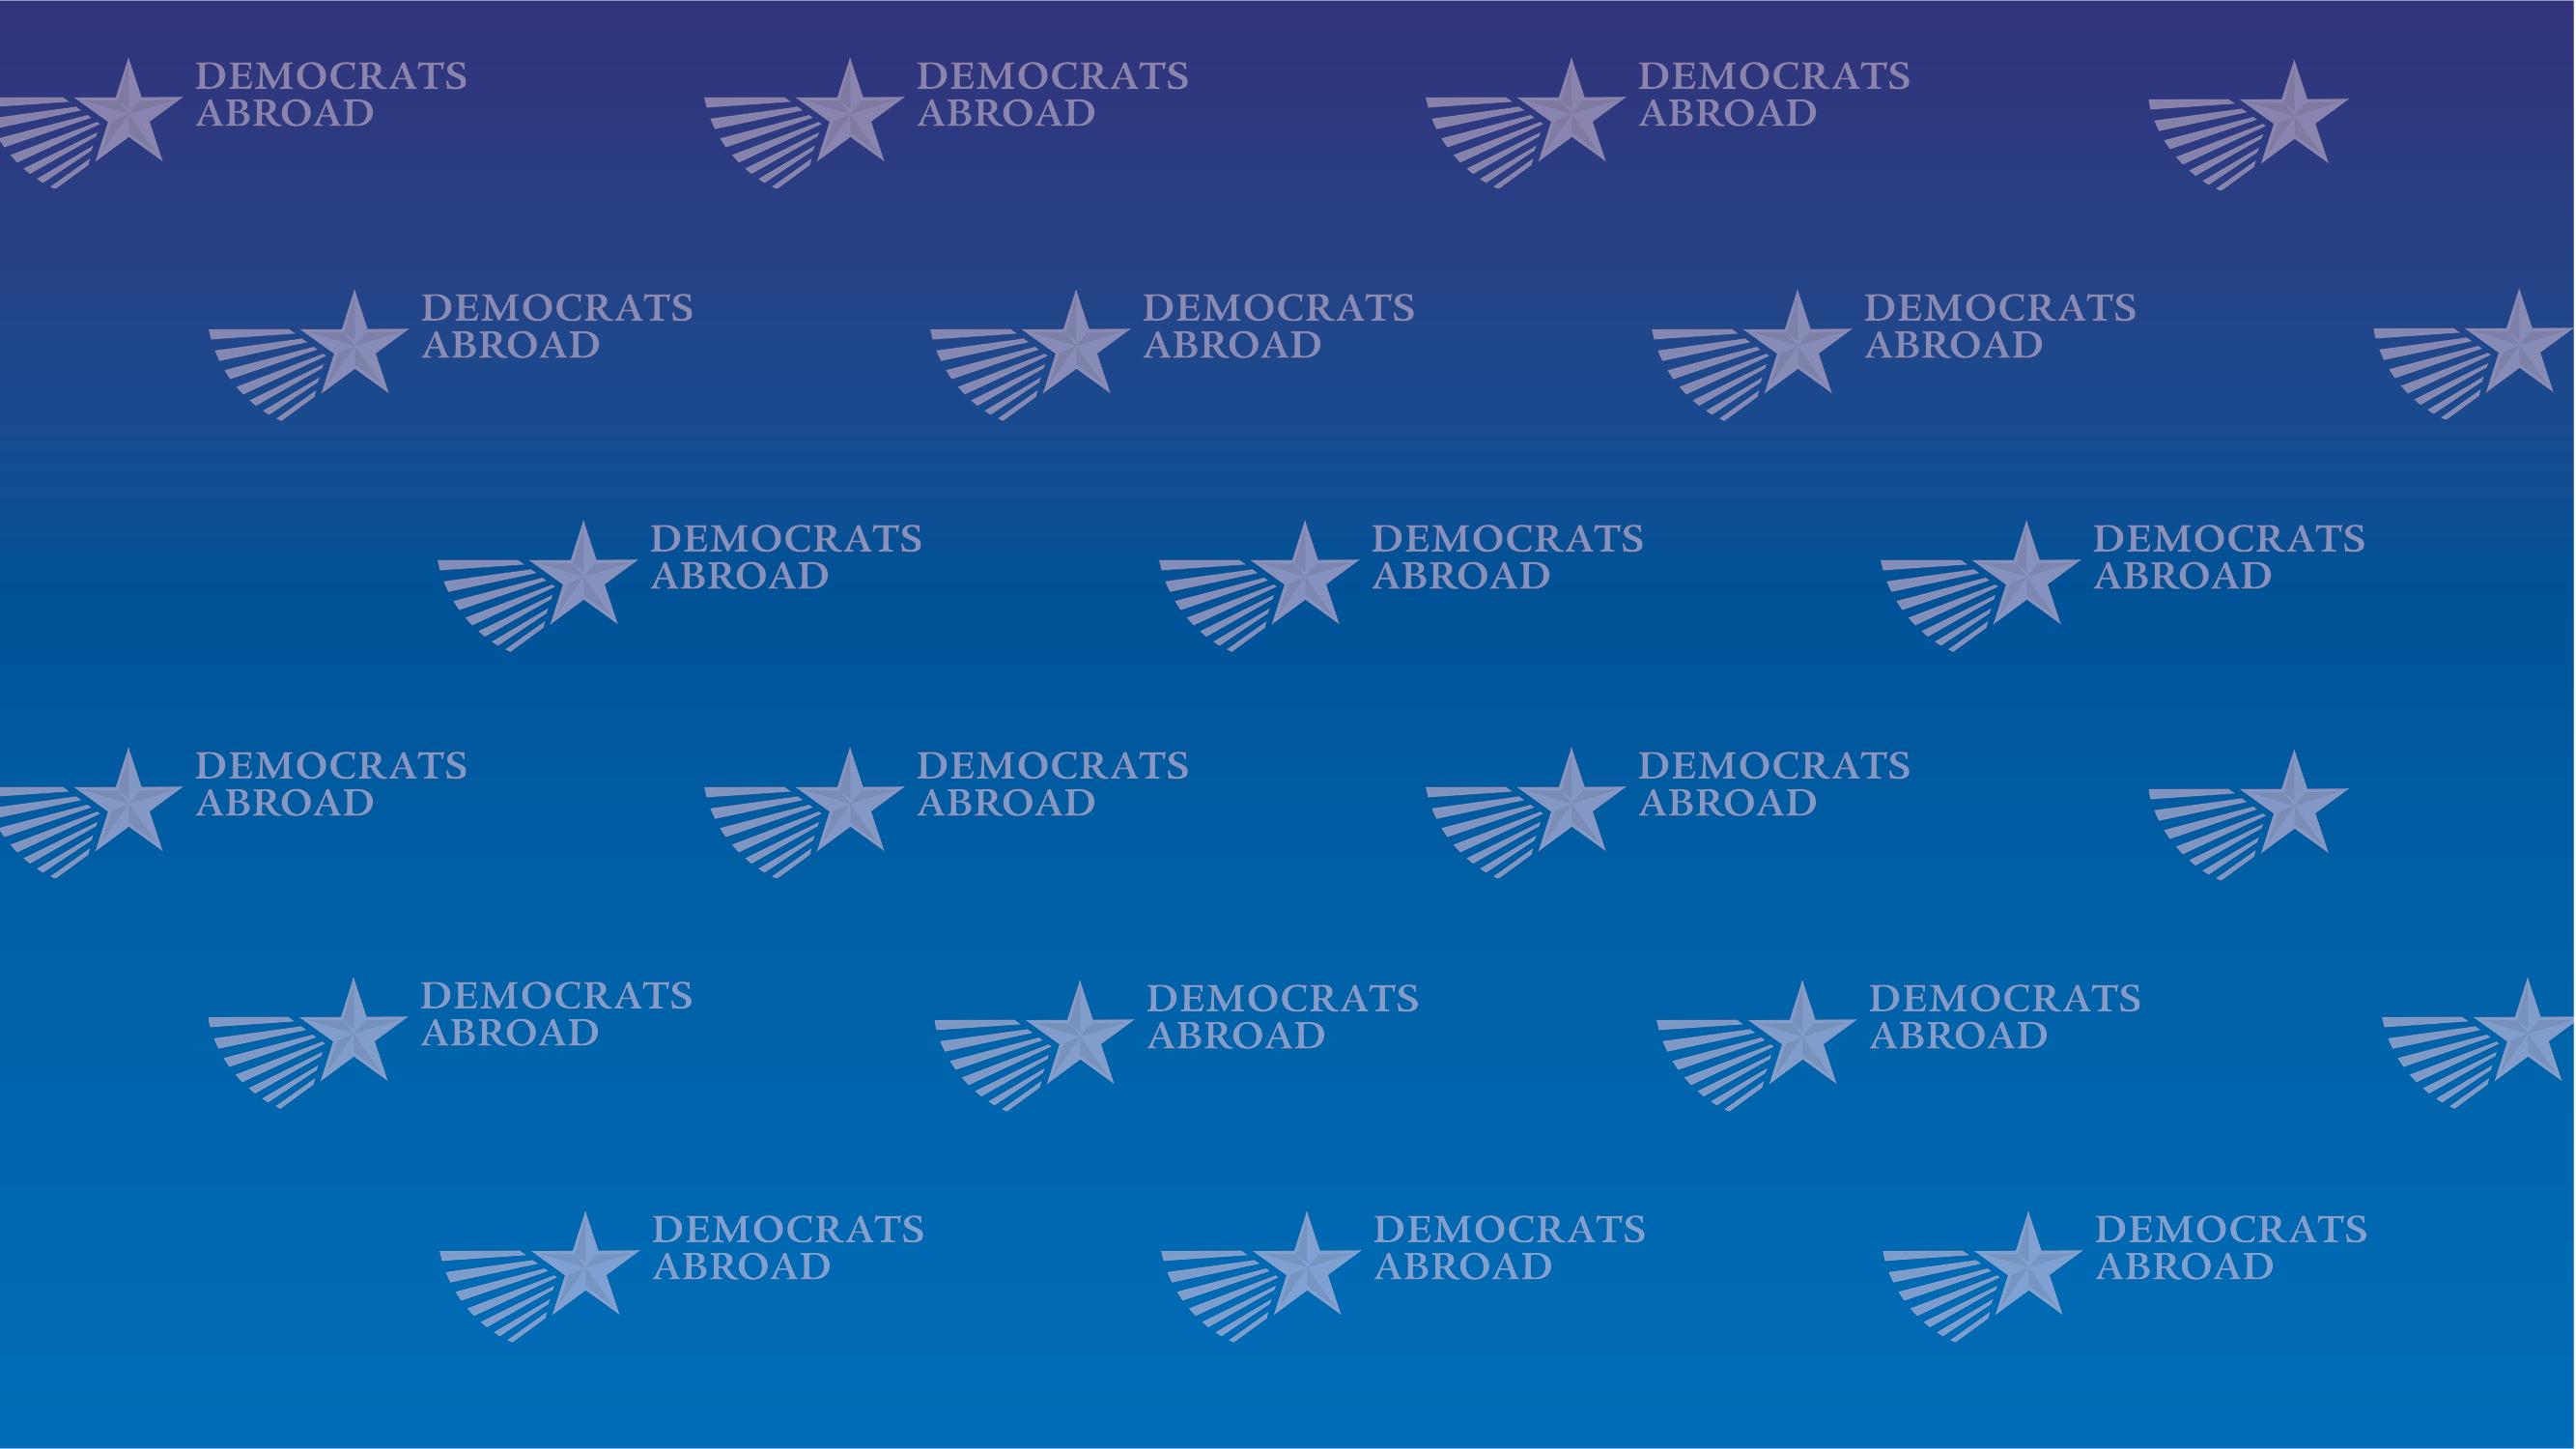 DA repeated logo blue gradient zoom background